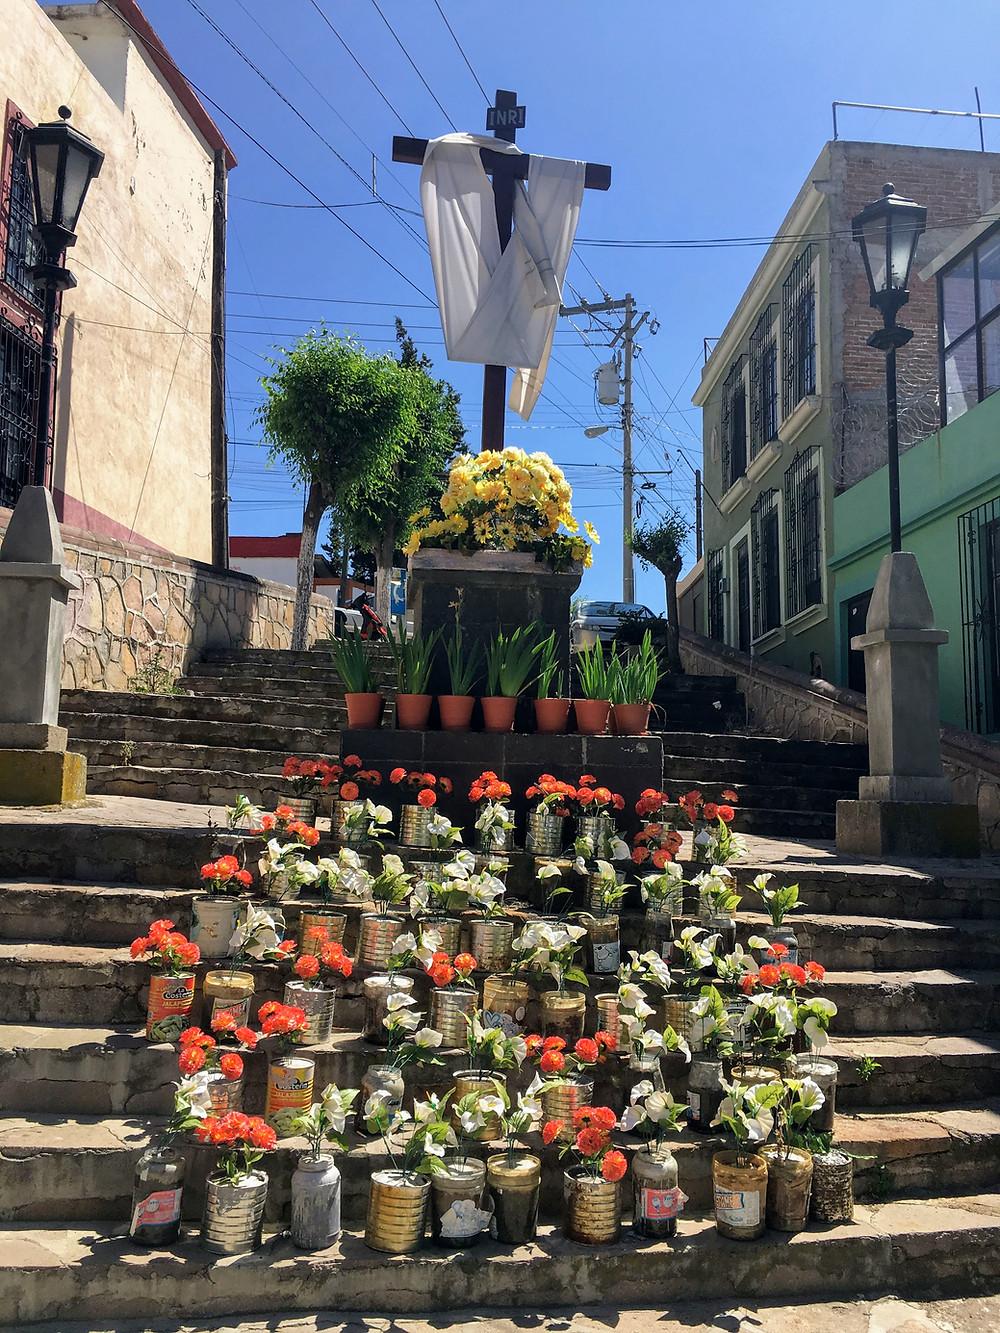 Zacatecas, Flowers, Mexico